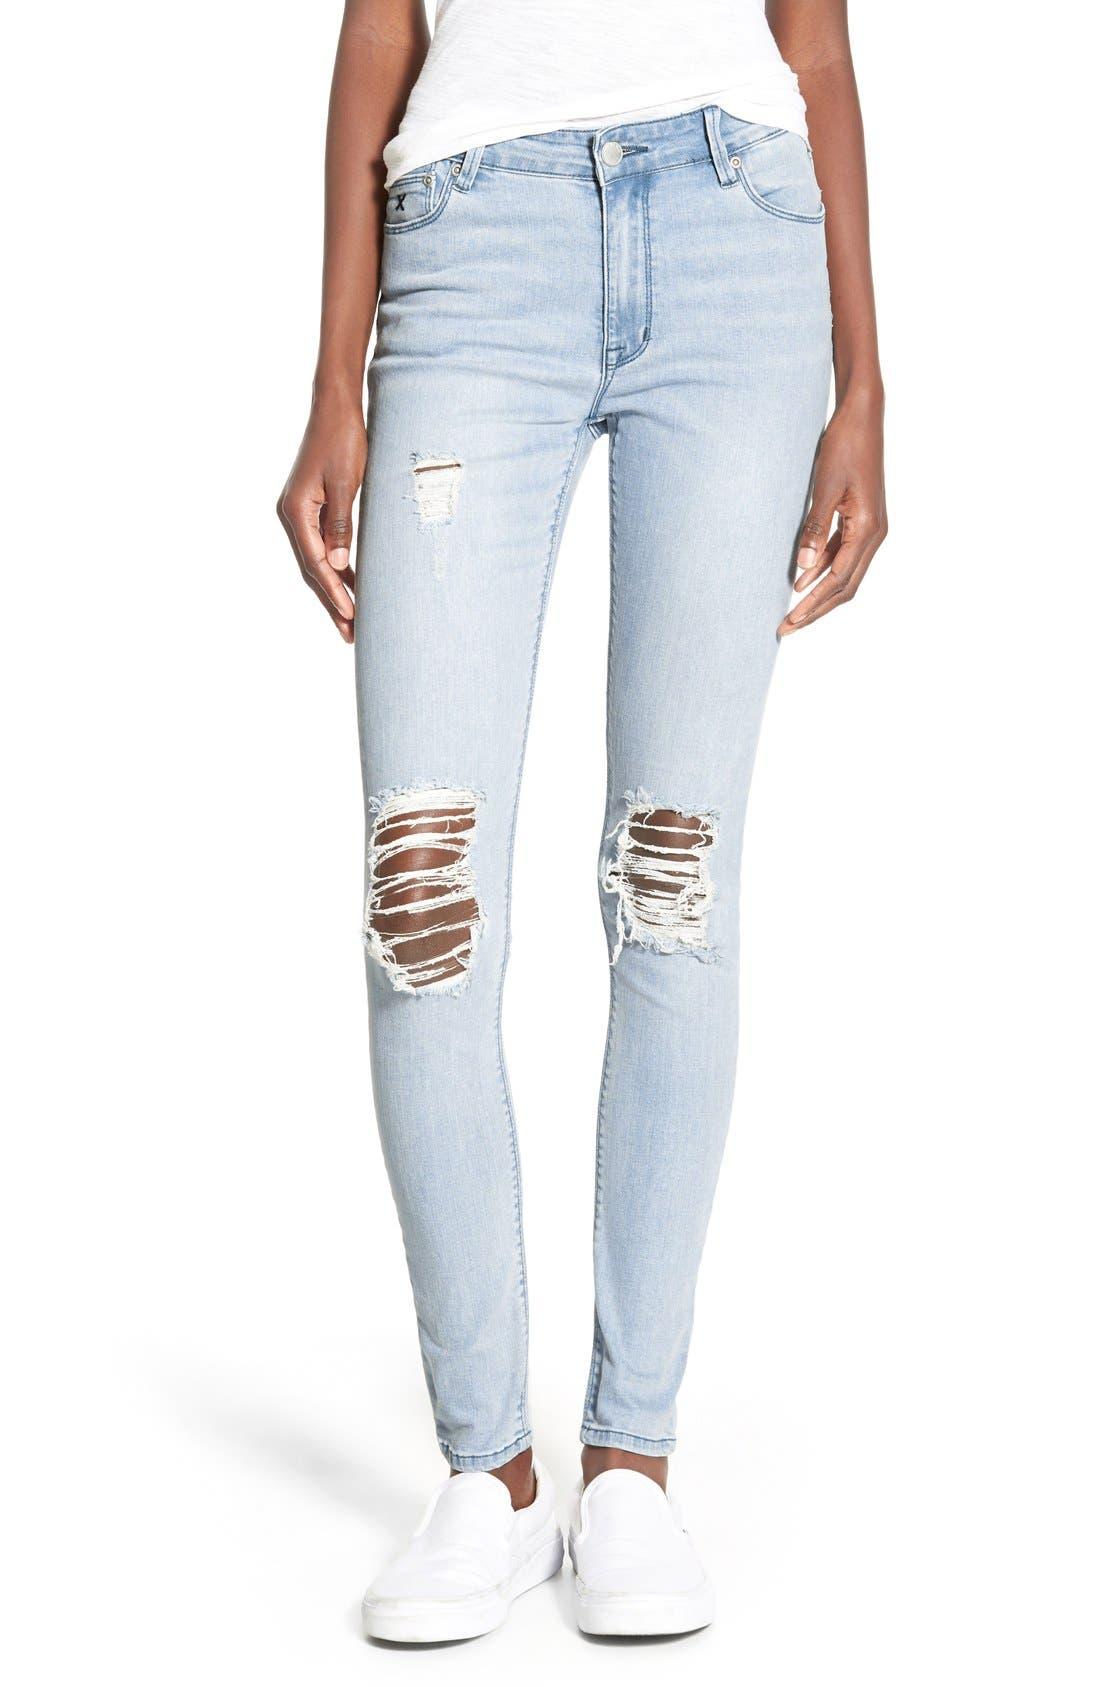 Alternate Image 1 Selected - RES Denim 'Kitty' Skinny Jeans (Love Moves Destroyer)